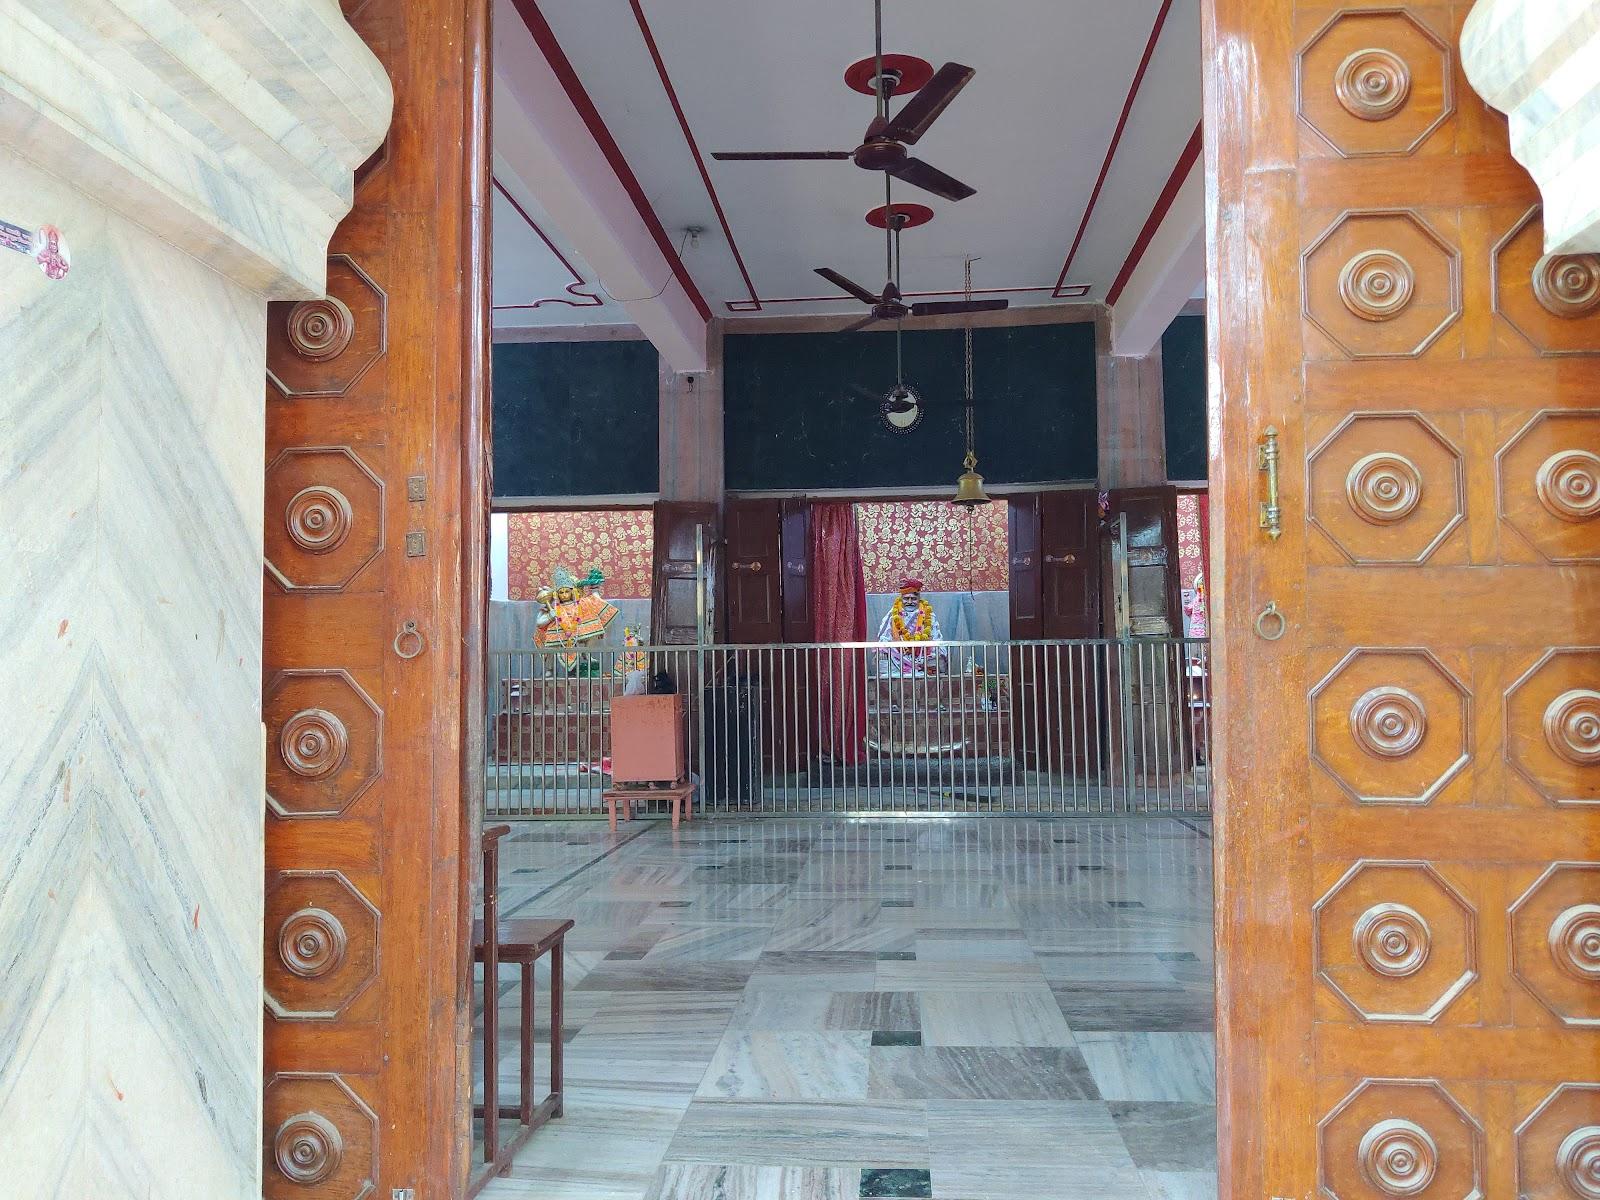 Neeb Karori Temple,Akabarpur